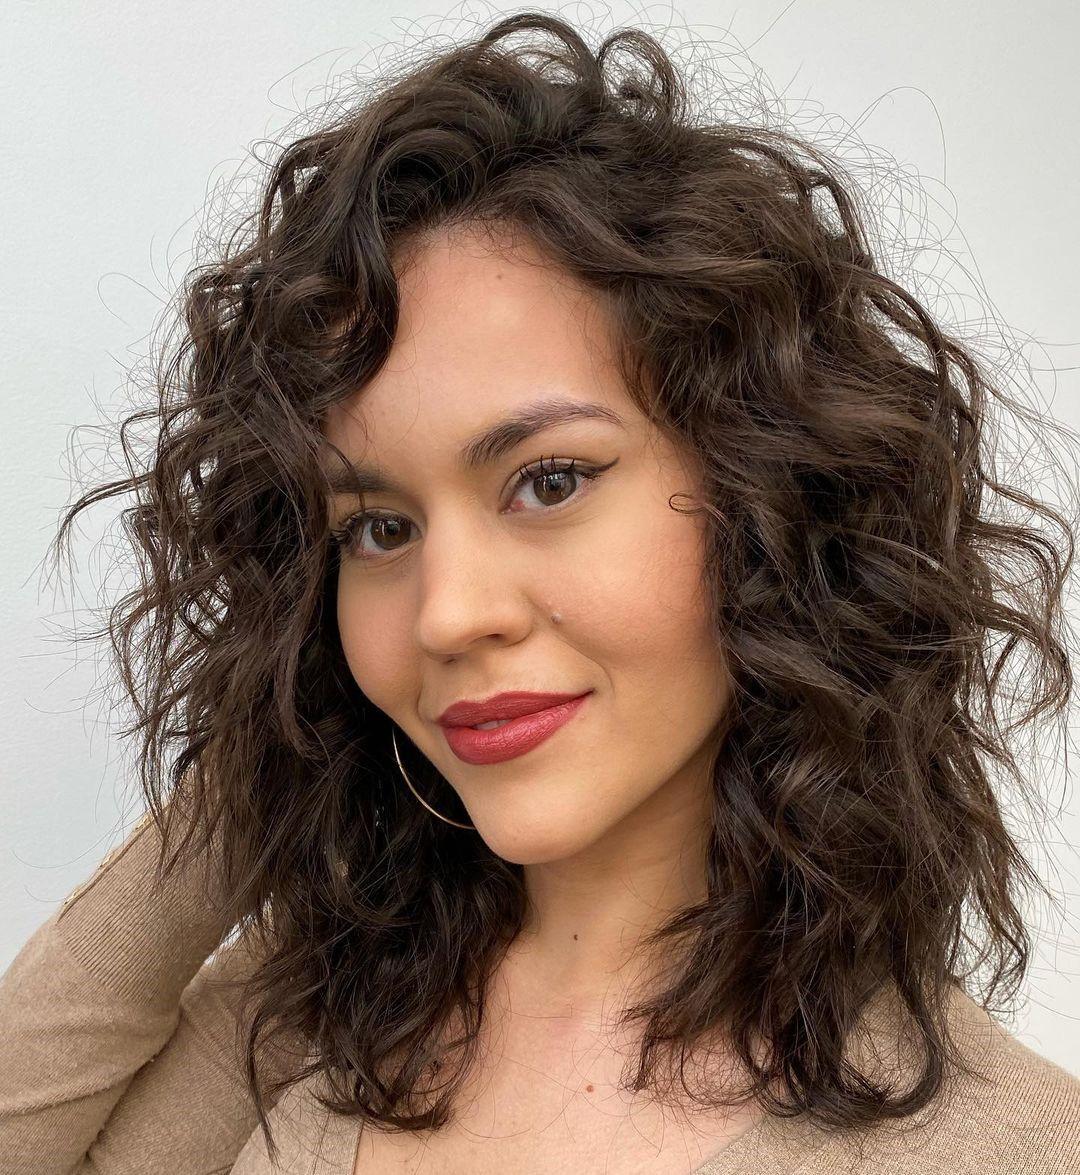 Shoulder-Length Hairdo for Curly Hair